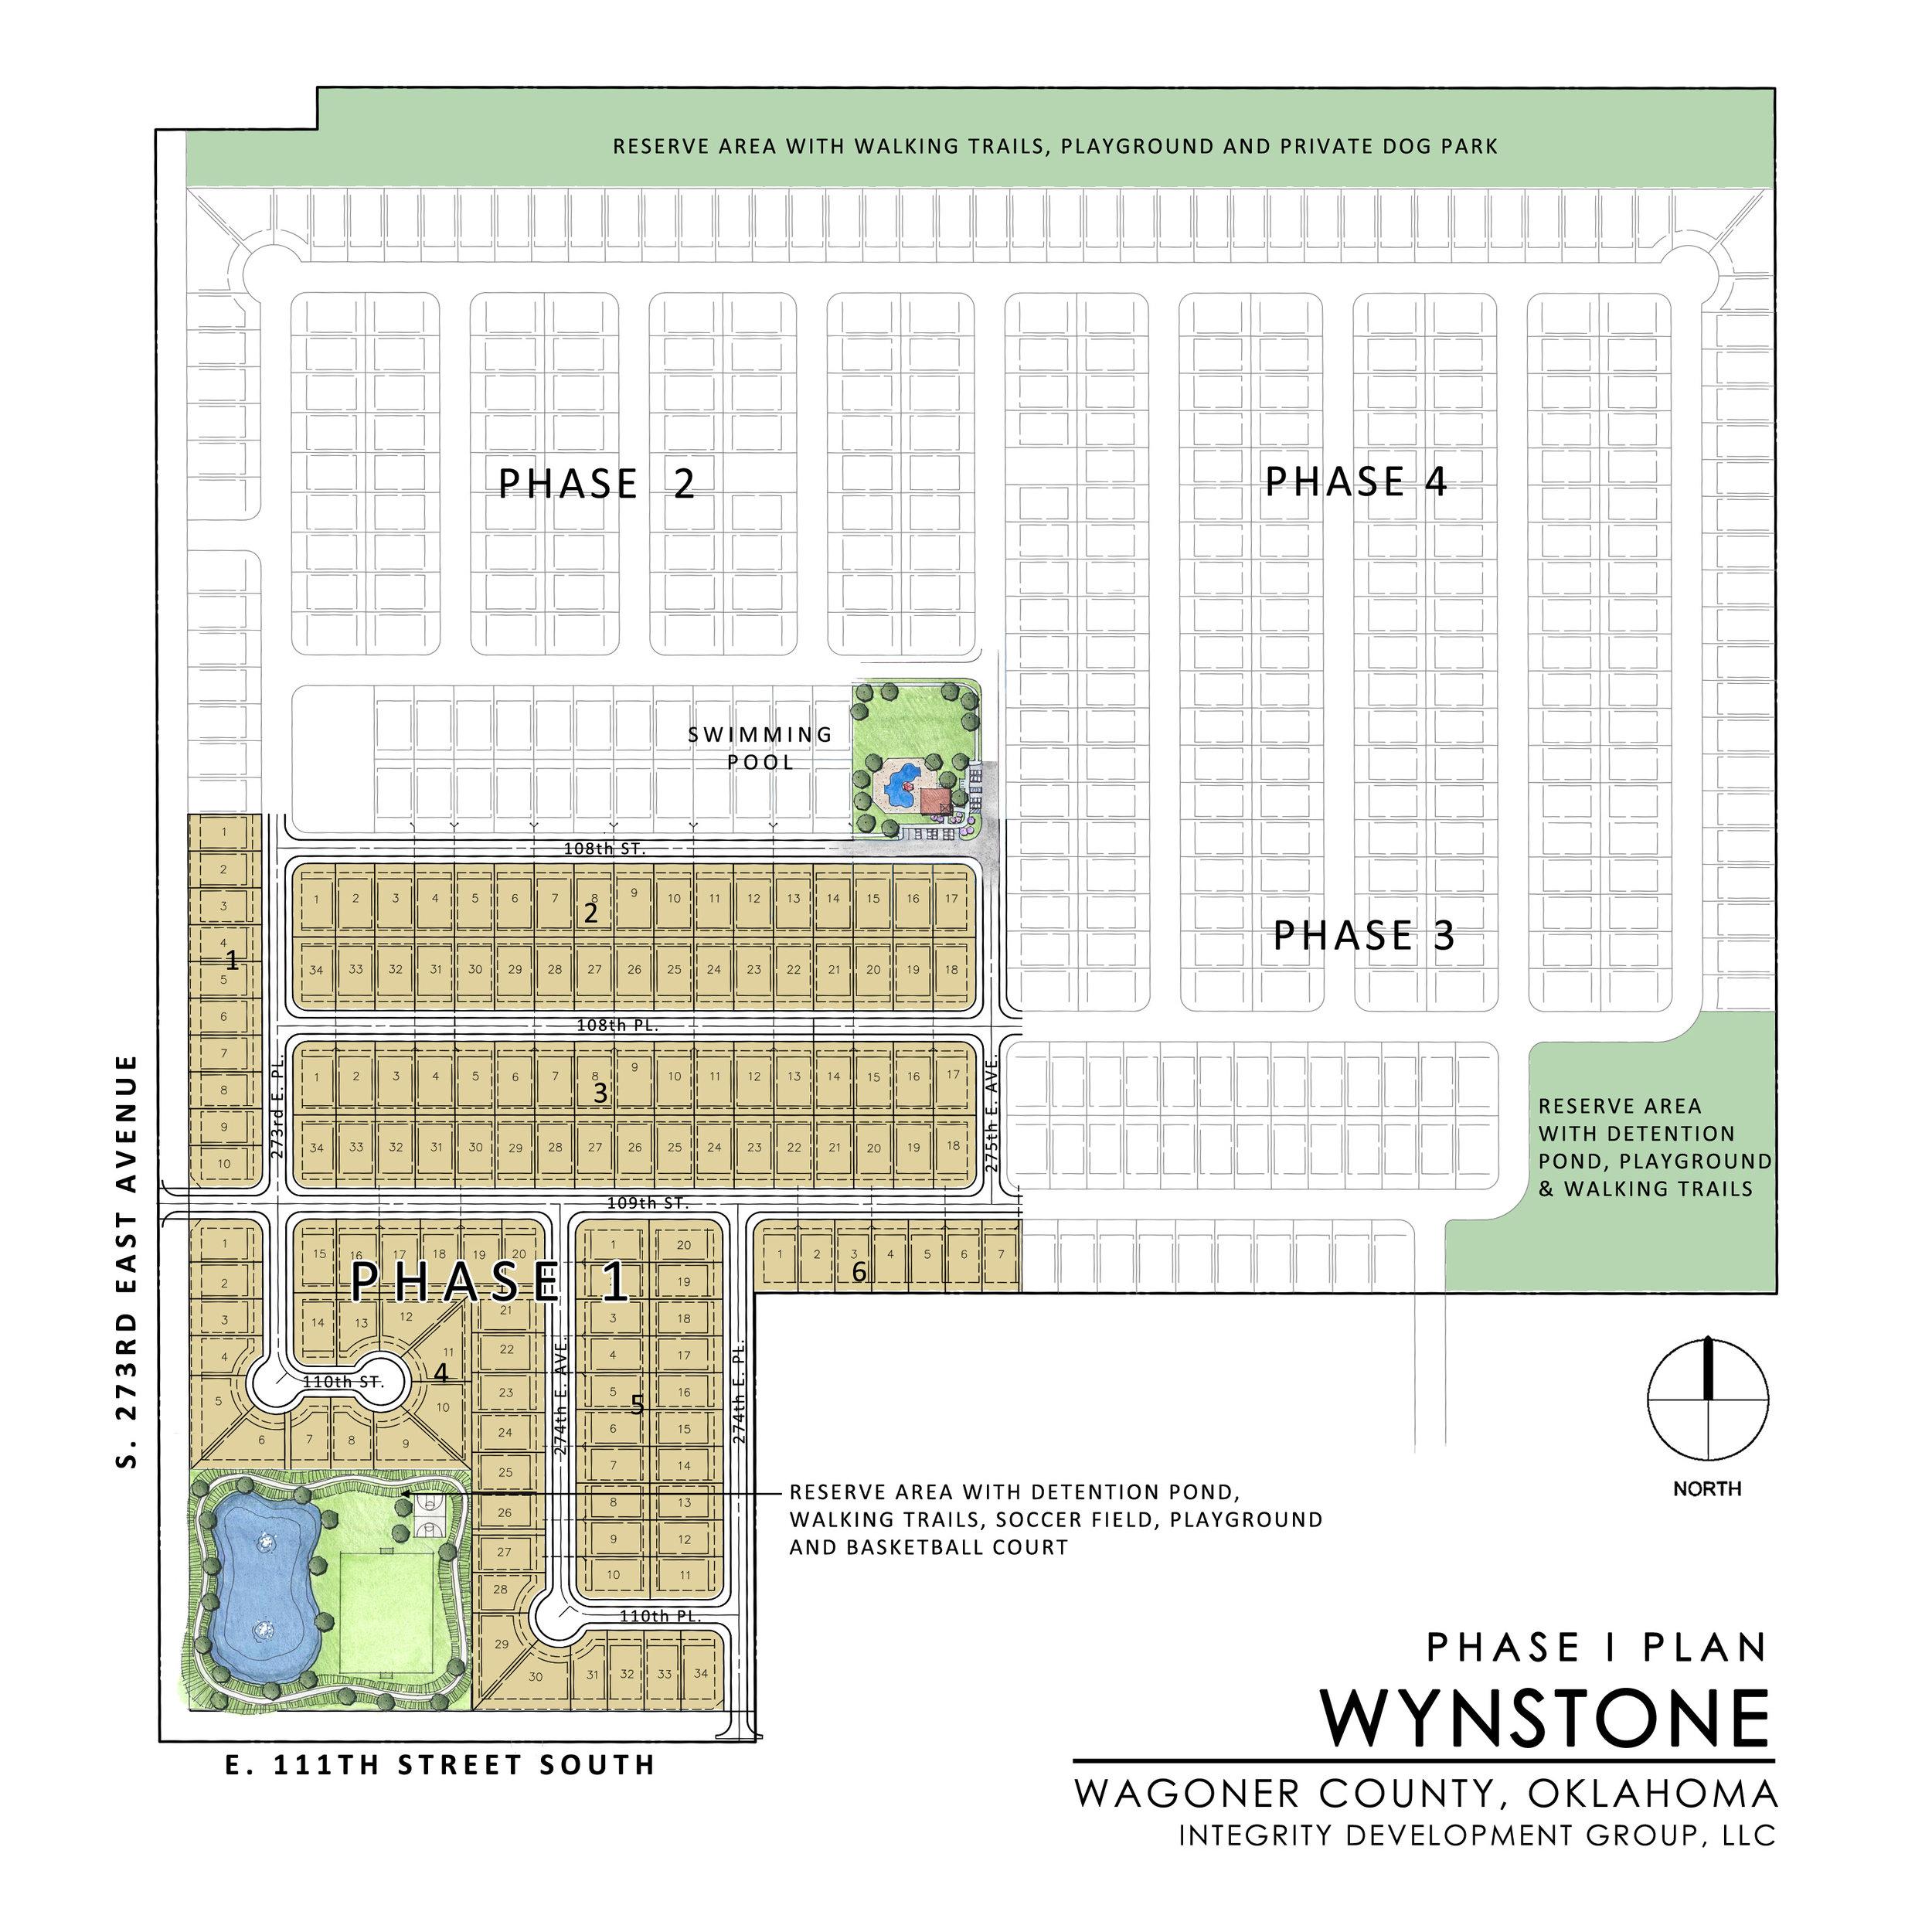 Wynstone Ph. 1 Plan.jpg